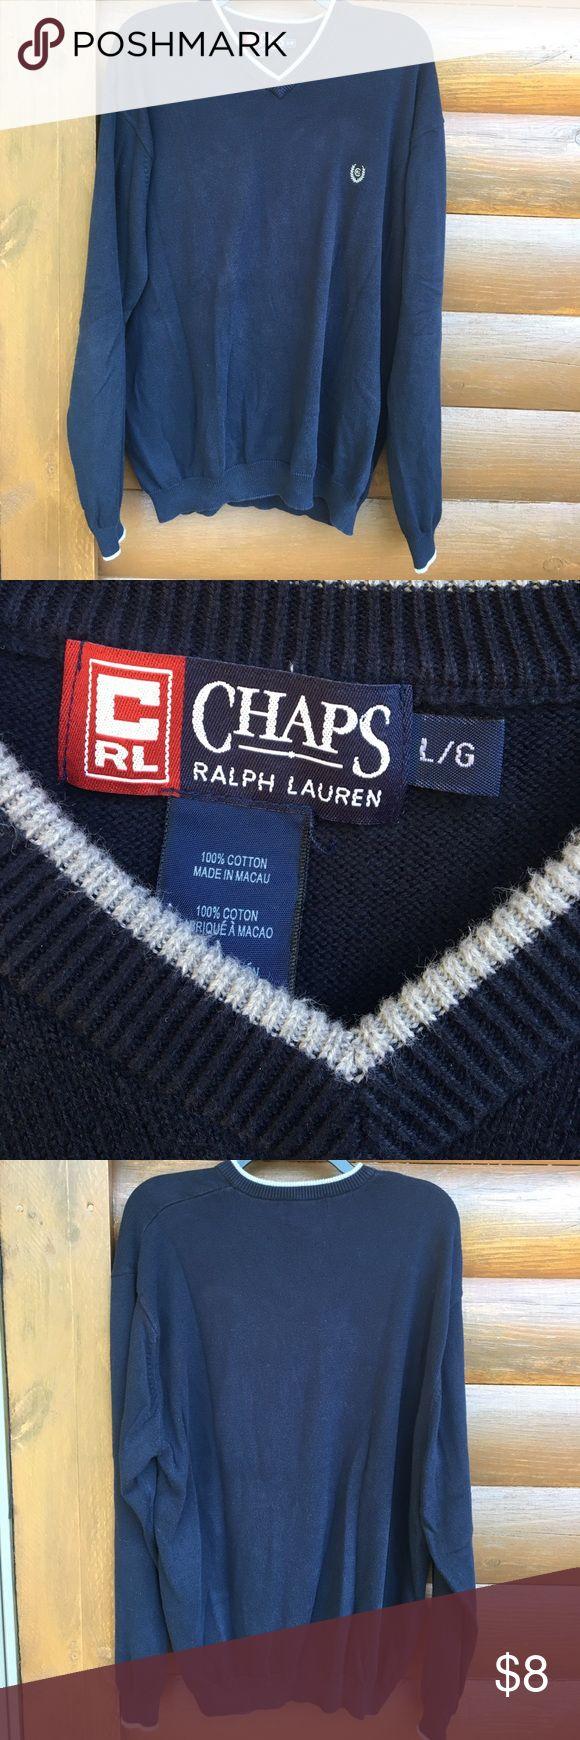 MENS Chaps Ralph Lauren Sweater 100% cotton Sweater Chaps Sweaters V-Neck